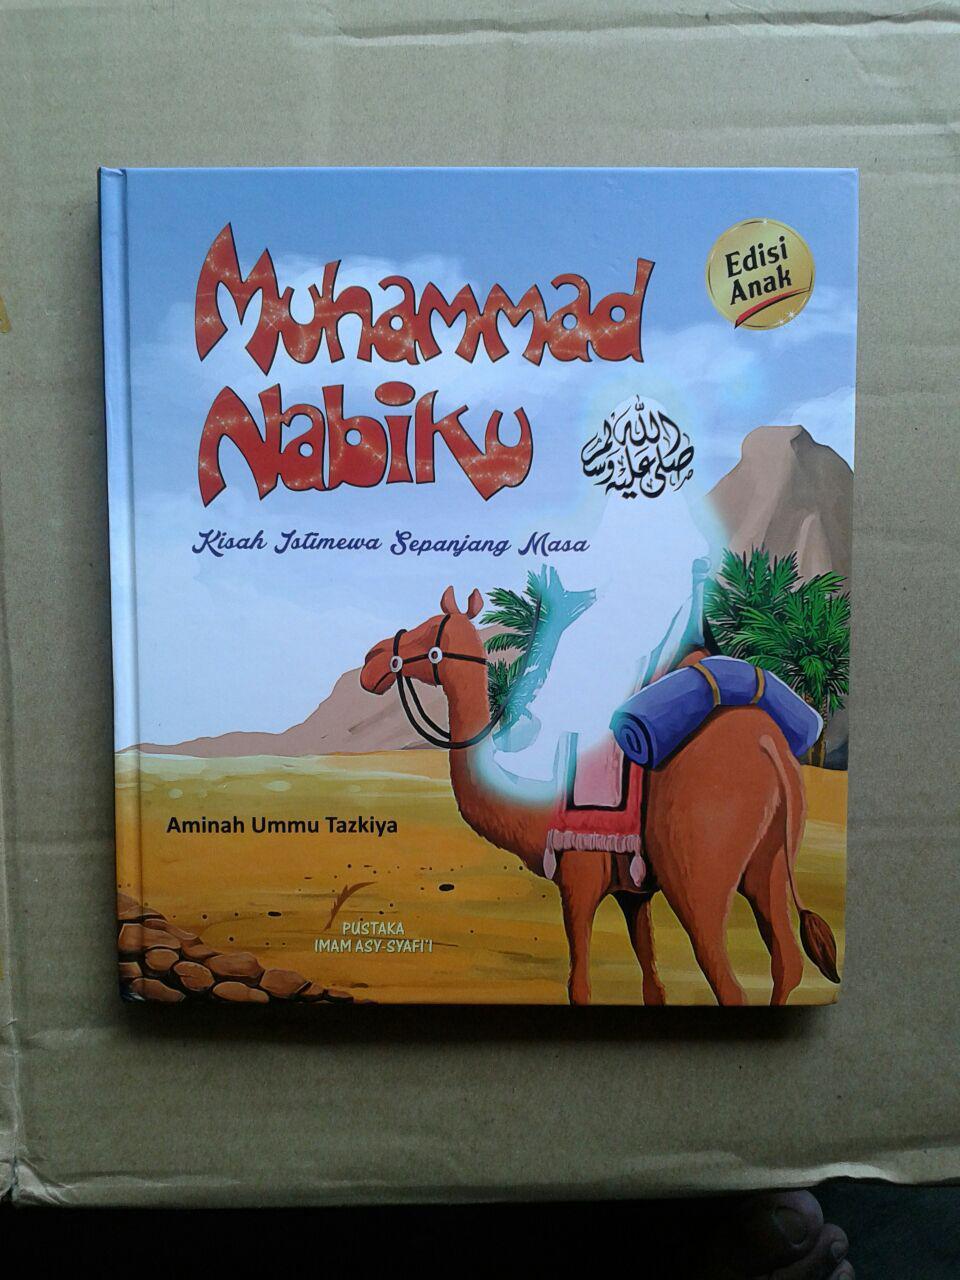 Buku Anak Muhammad Nabiku cover 2